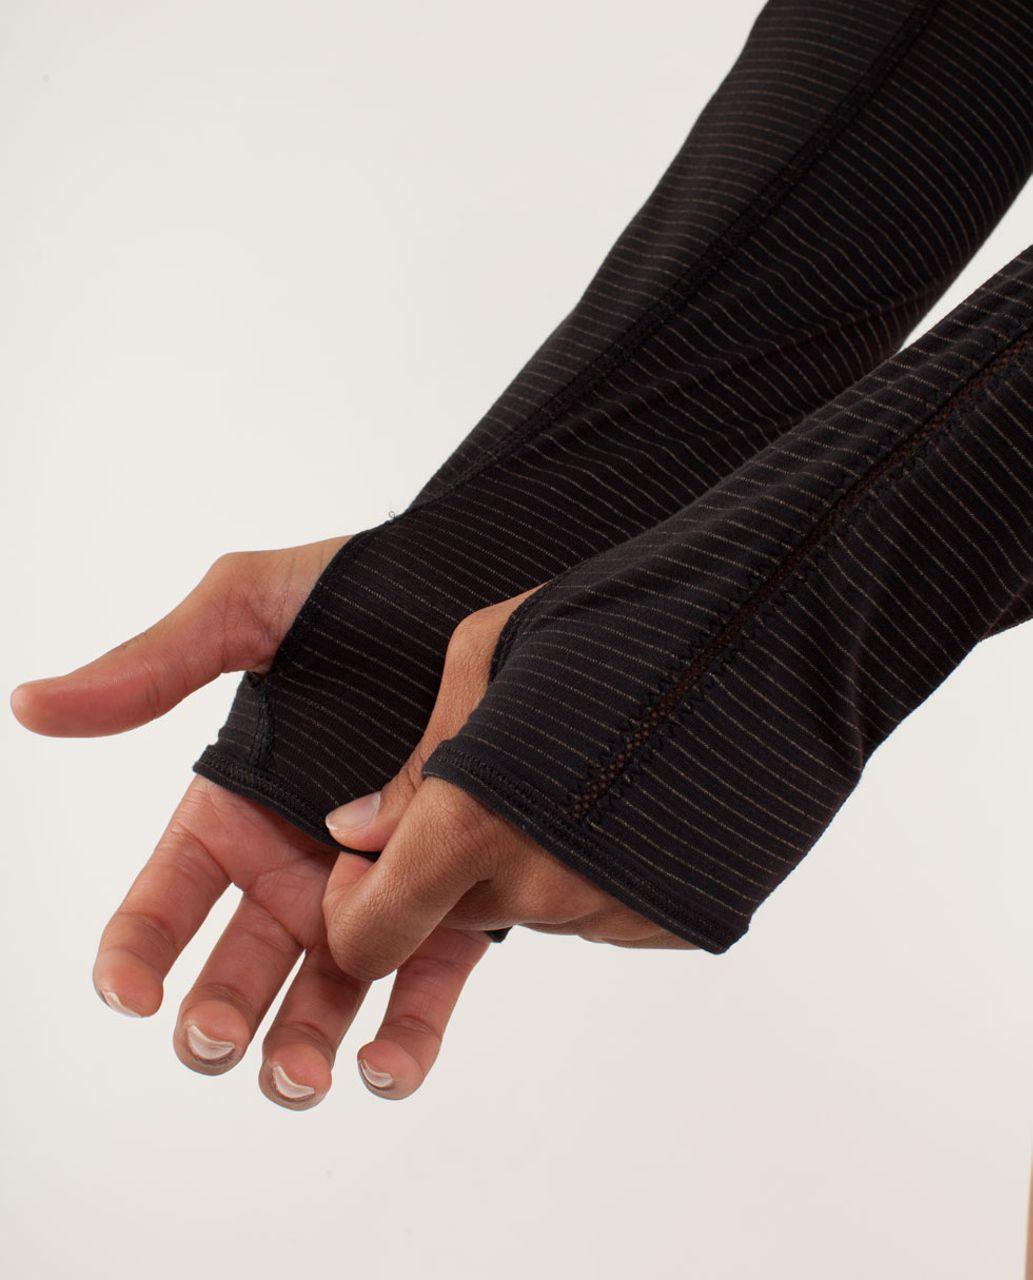 Lululemon Run:  Silver Lining Long Sleeve - Black